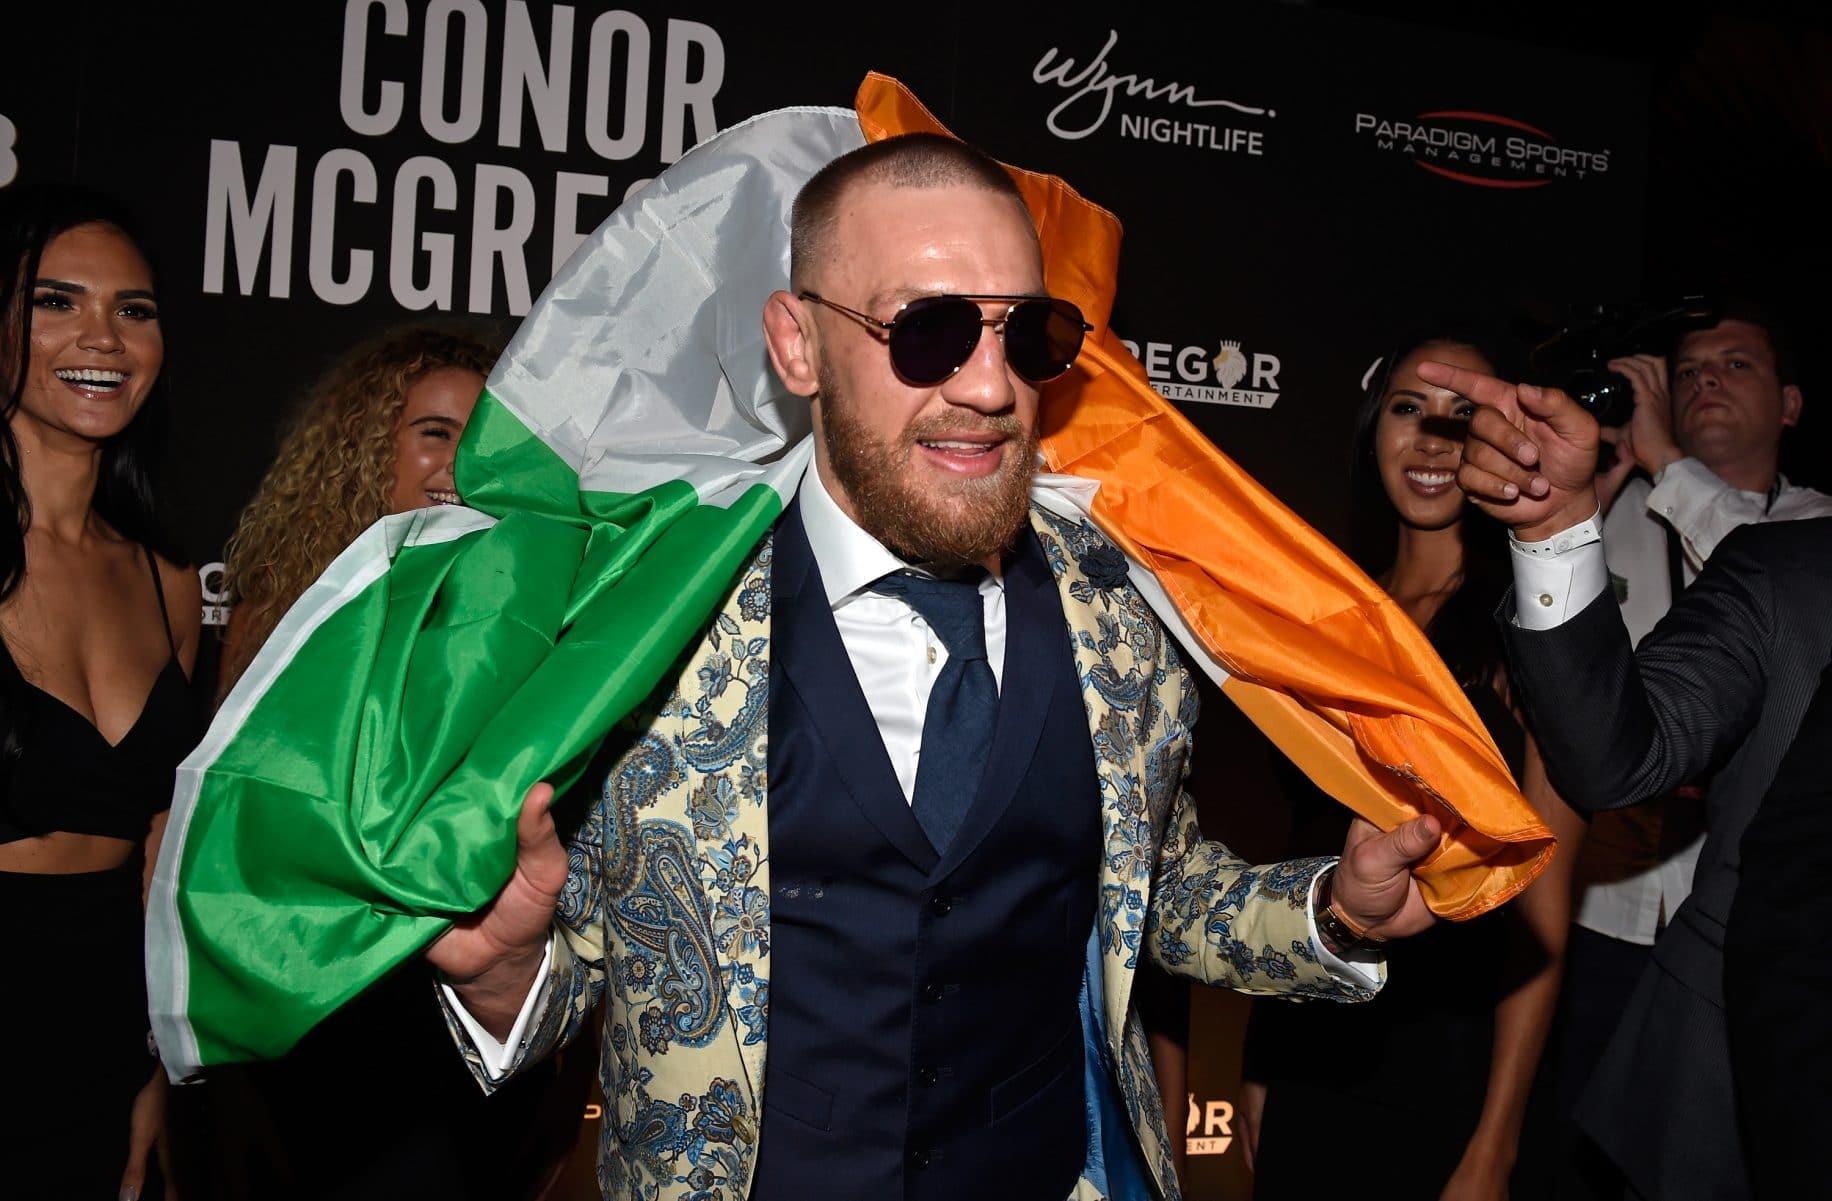 Conor McGregor Could Make Pro Wrestling Debut At Wrestlemania (Report)